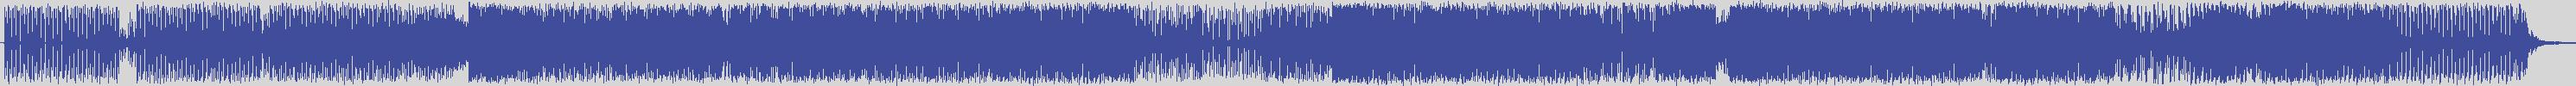 just_digital_records [SP2499] Tommy Boccuto - Speed Funk [Original Mix] audio wave form